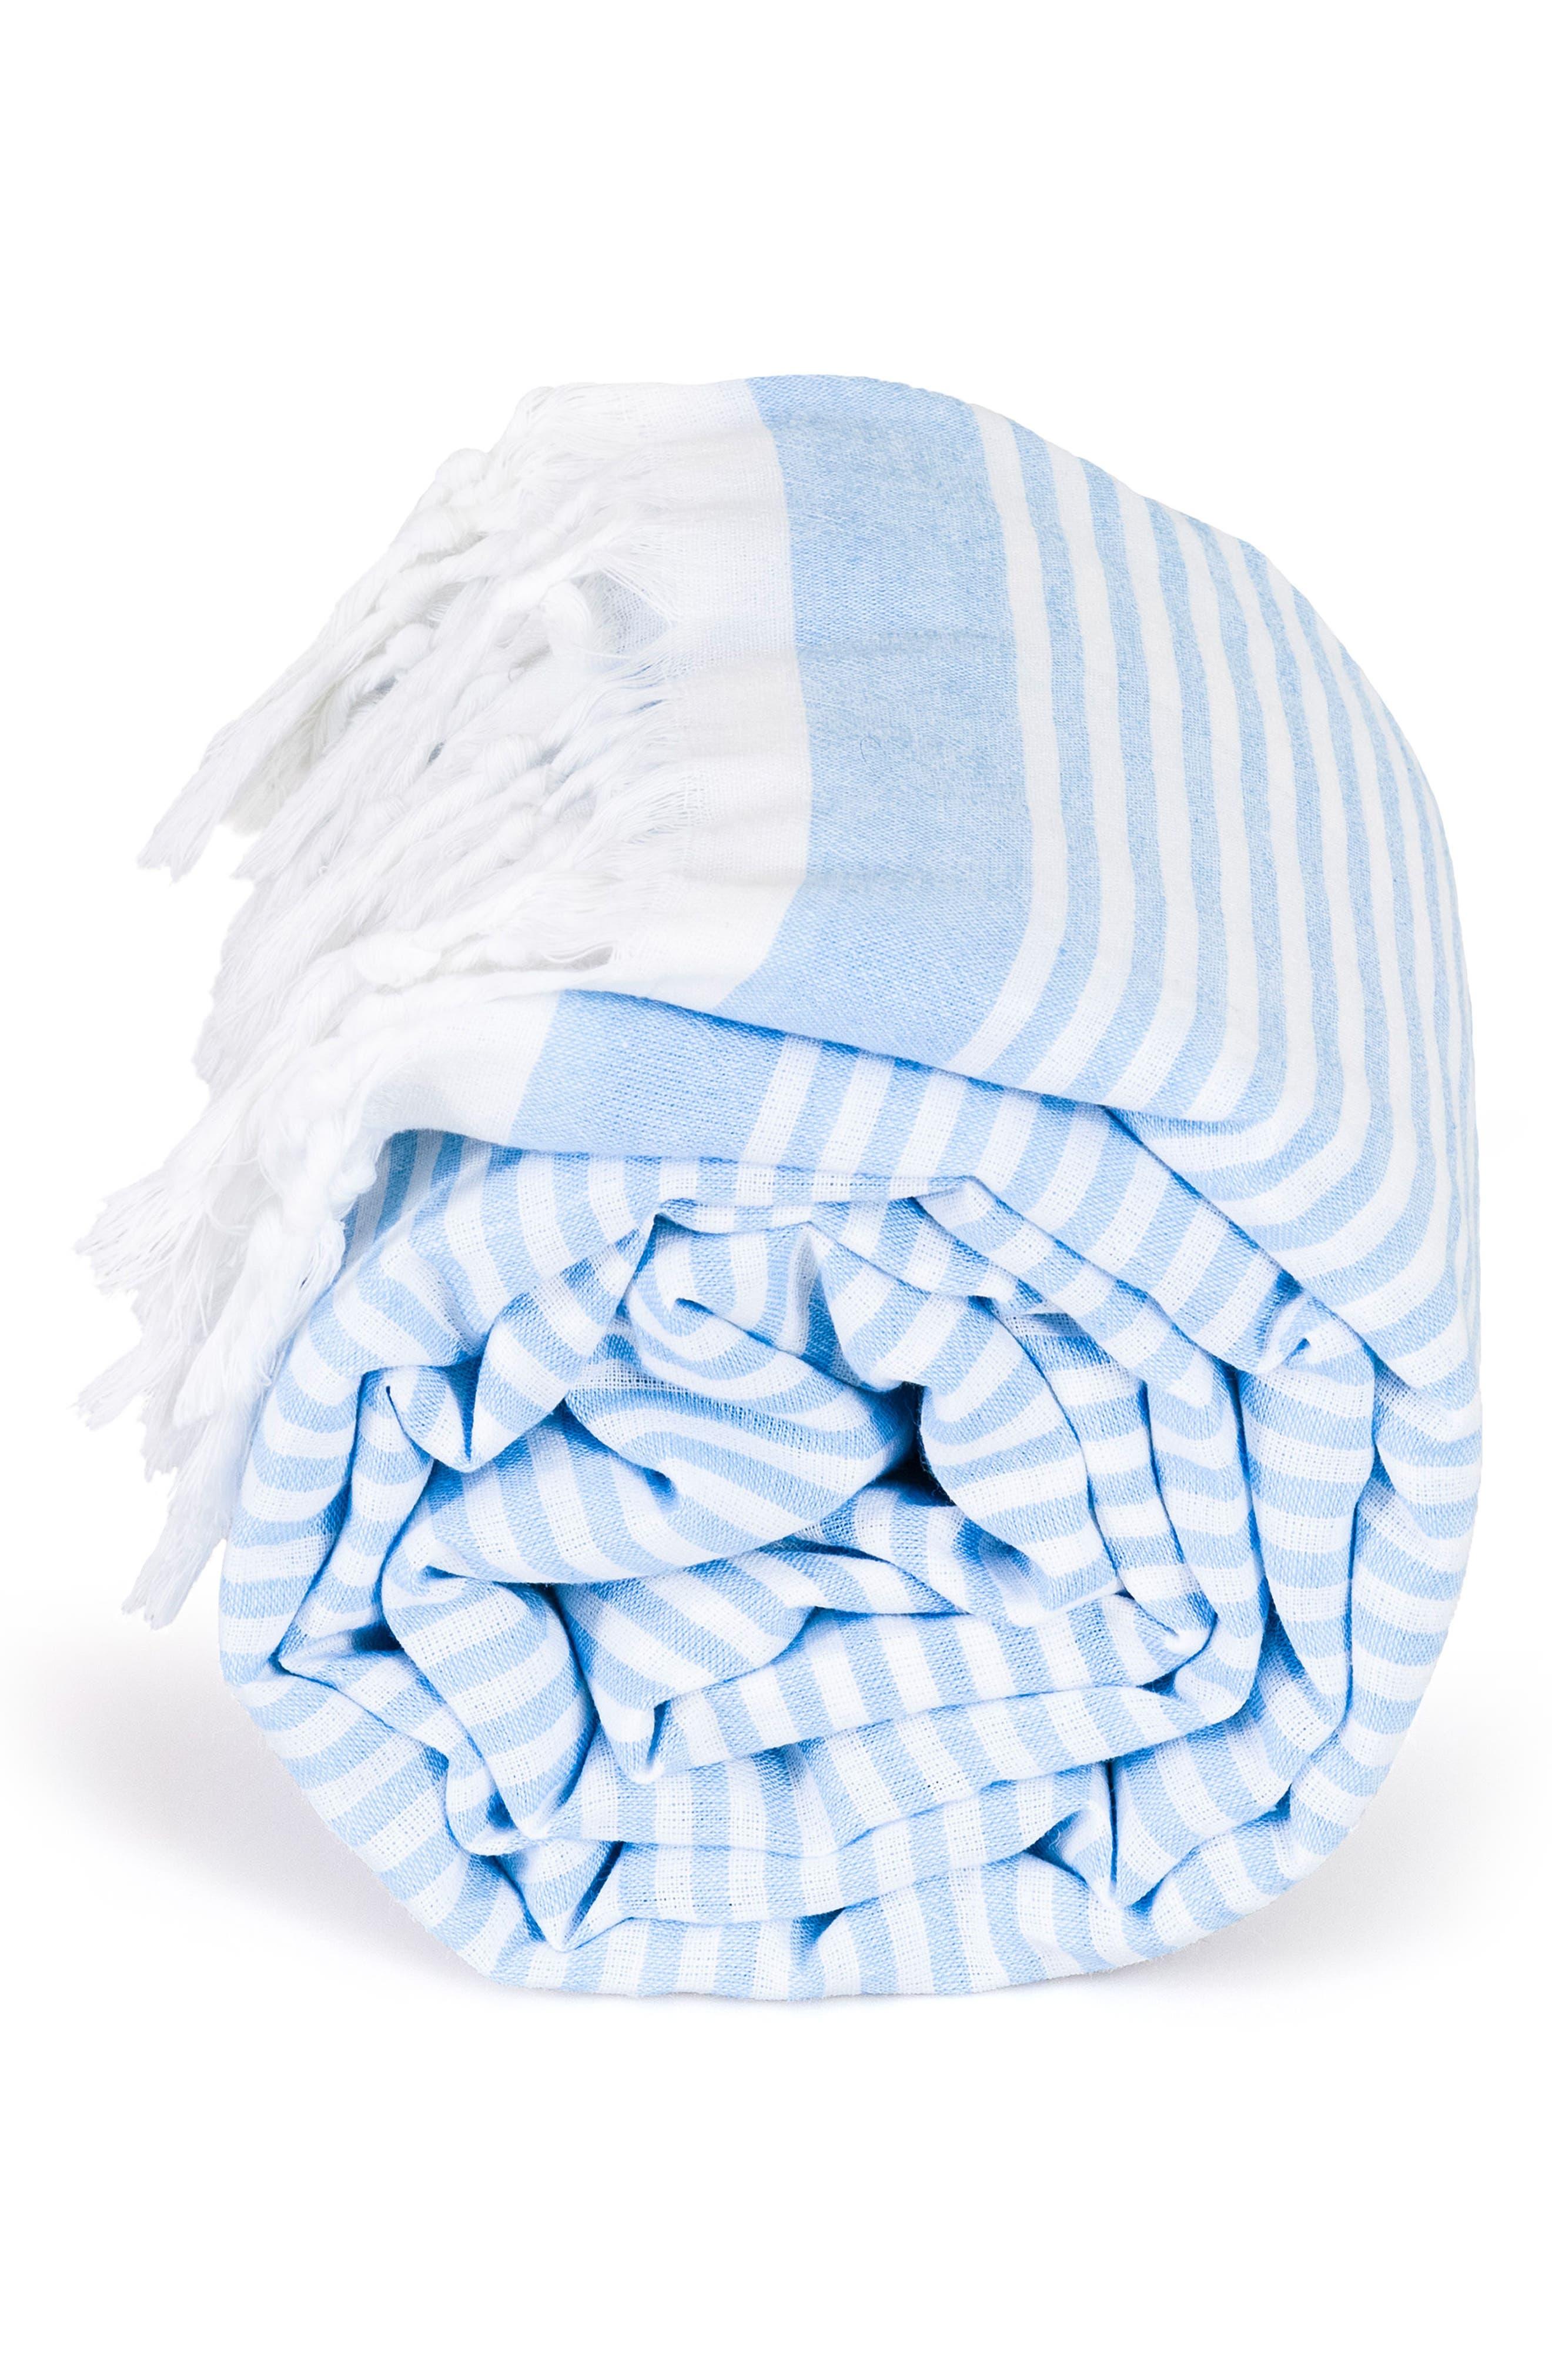 Soft Stripes Turkish Pestemal Towel,                             Alternate thumbnail 2, color,                             Sky Blue